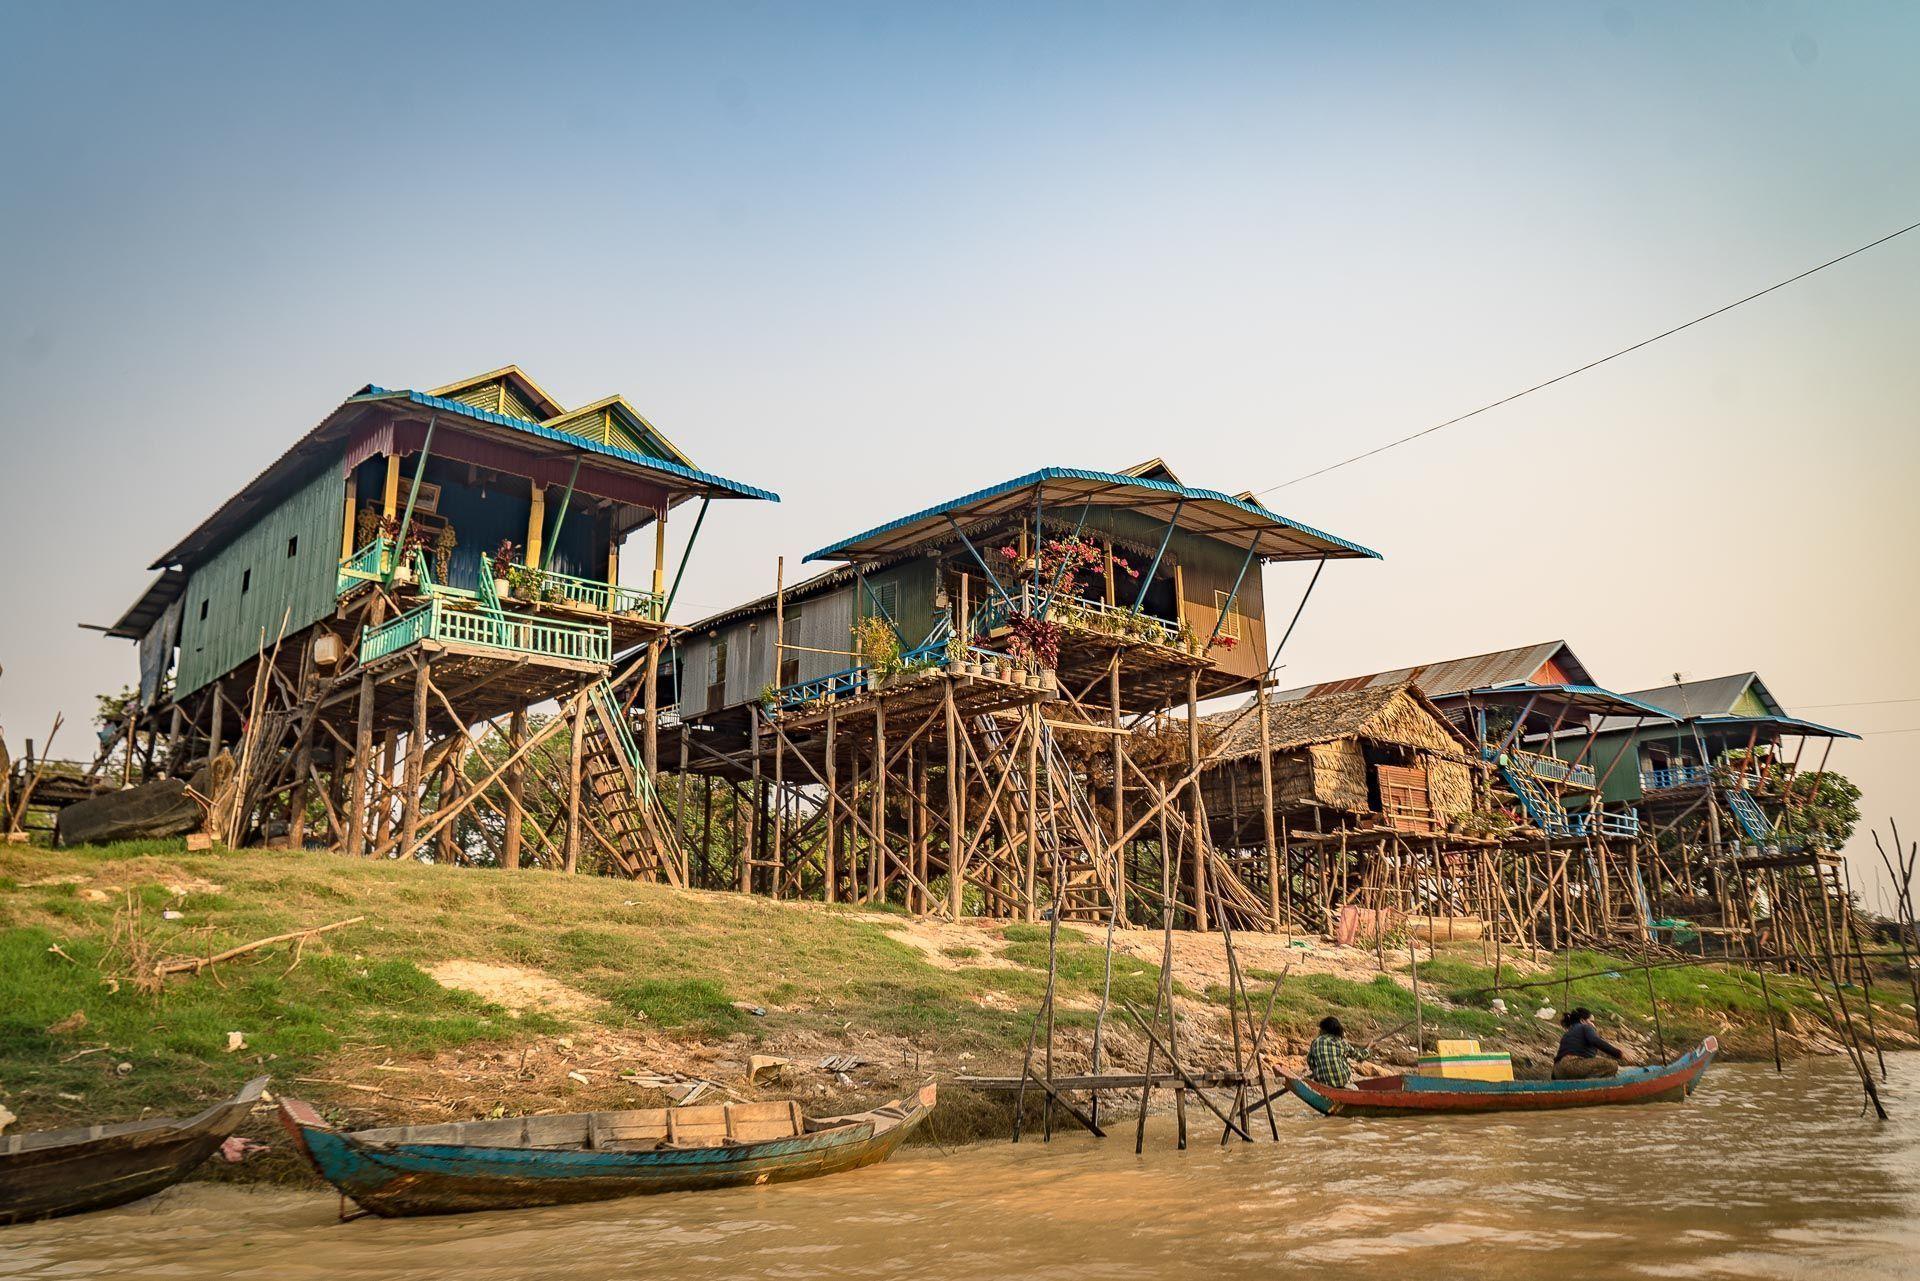 Lesvoyageuses-guide-voyage-siem-reap-angkor-cambodge-lavender-jeep-8